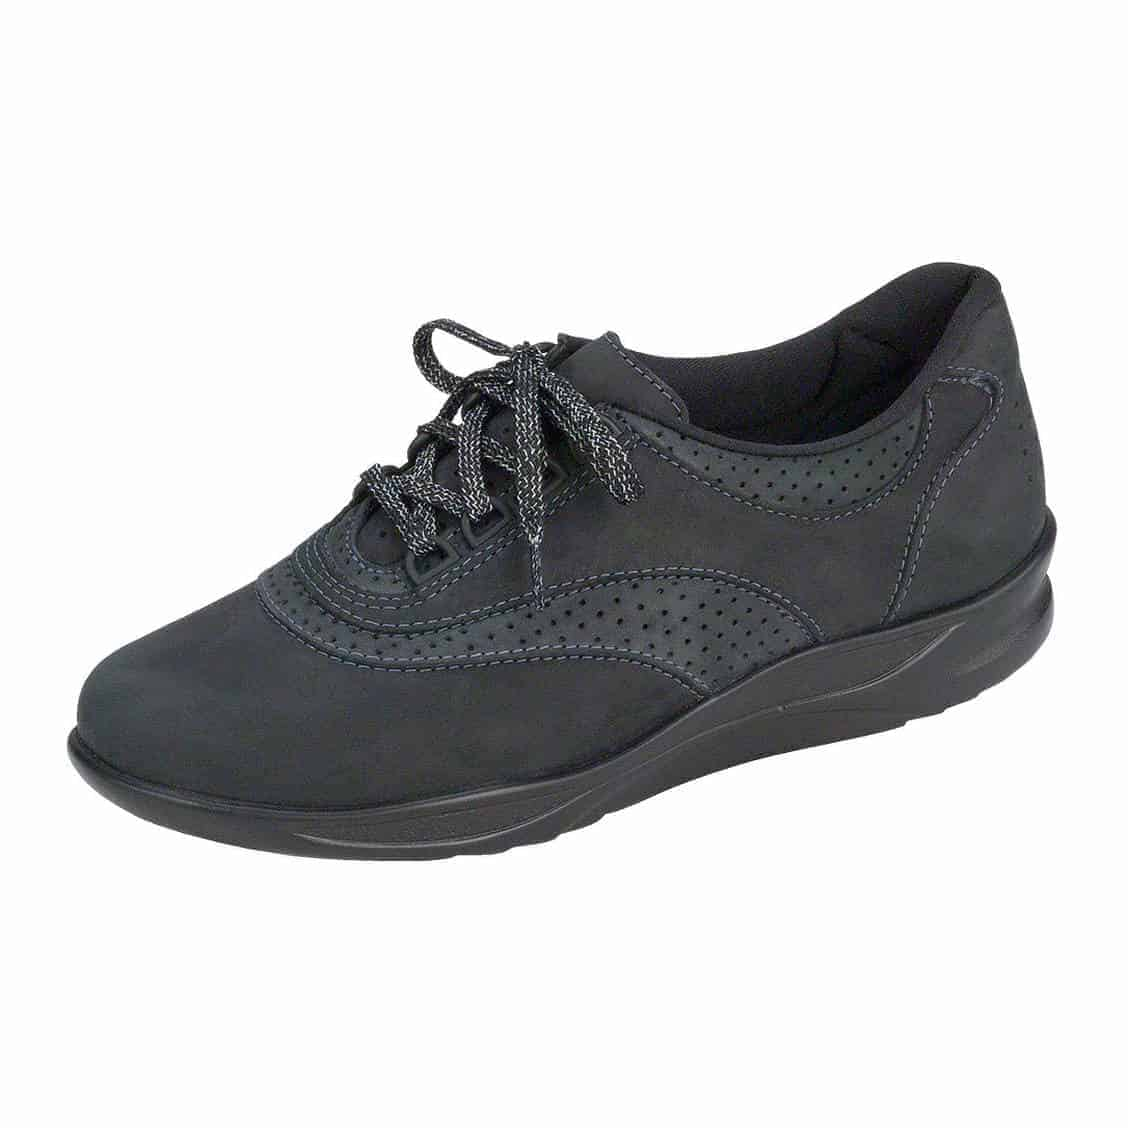 sas-womens-walk-easy-nero-charcoal-nubuck-2380-237-2